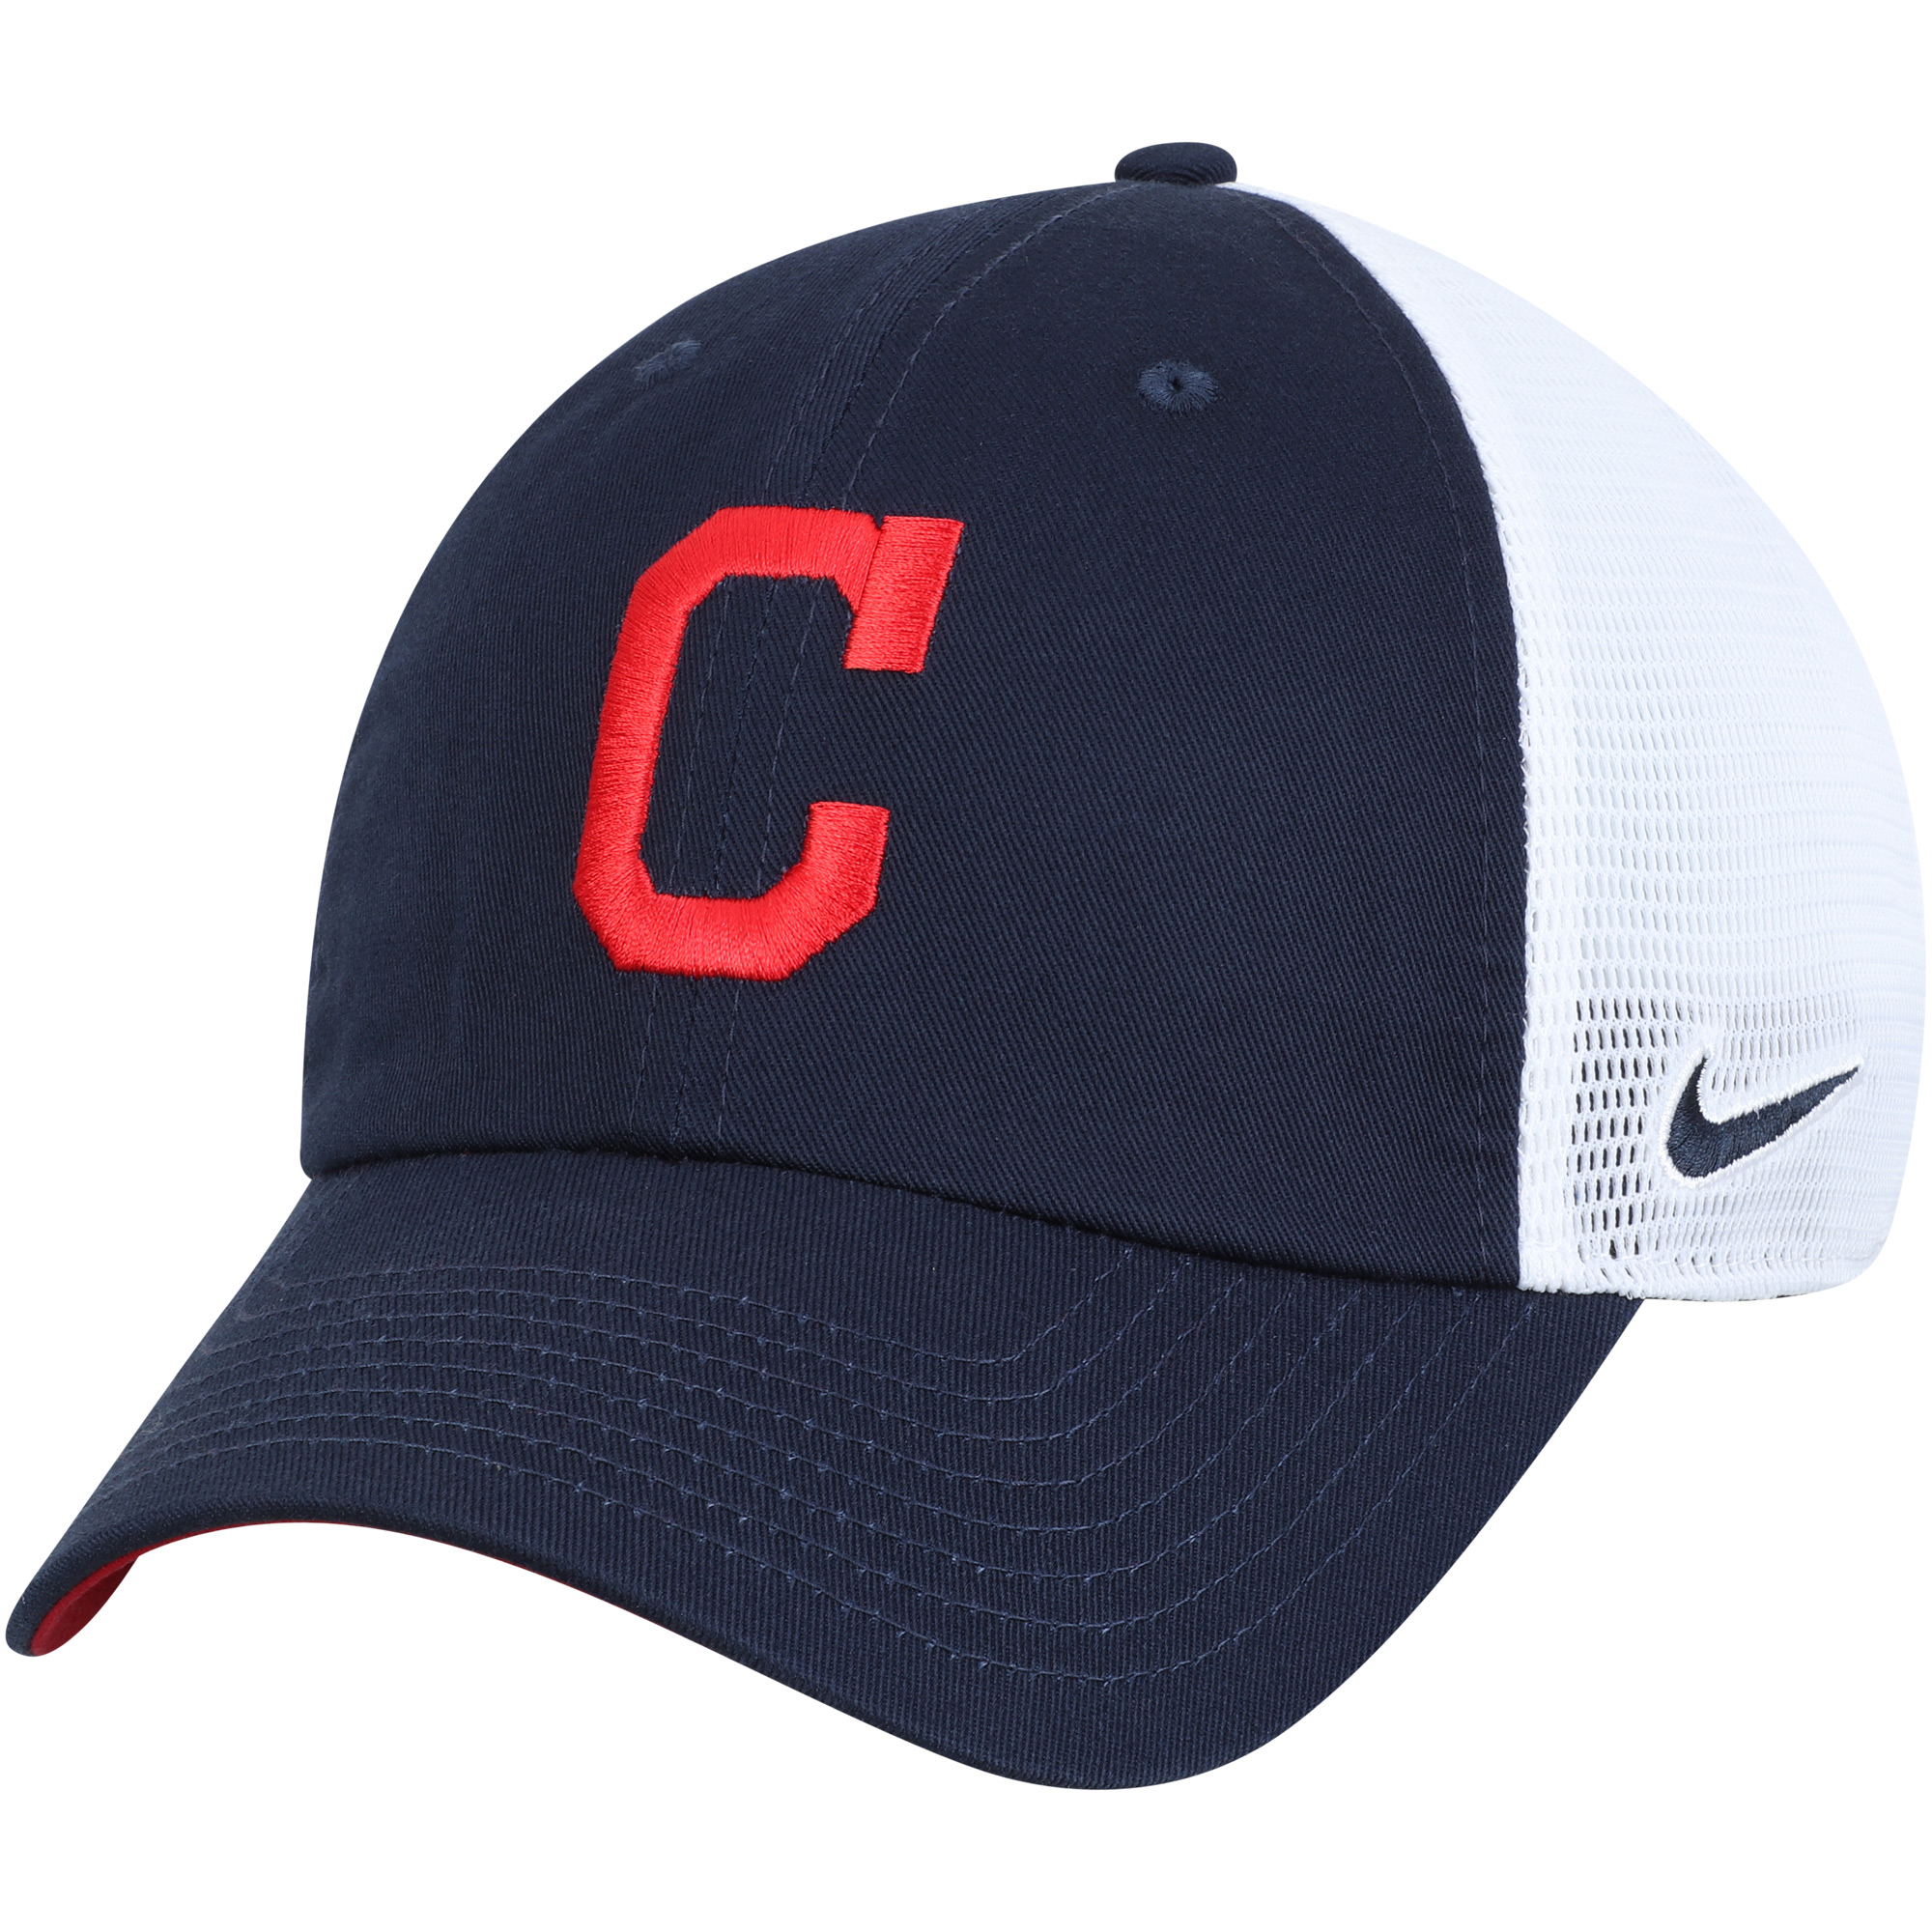 Cleveland Indians Nike Heritage 86 Team Trucker Adjustable Hat - Navy/White - OSFA